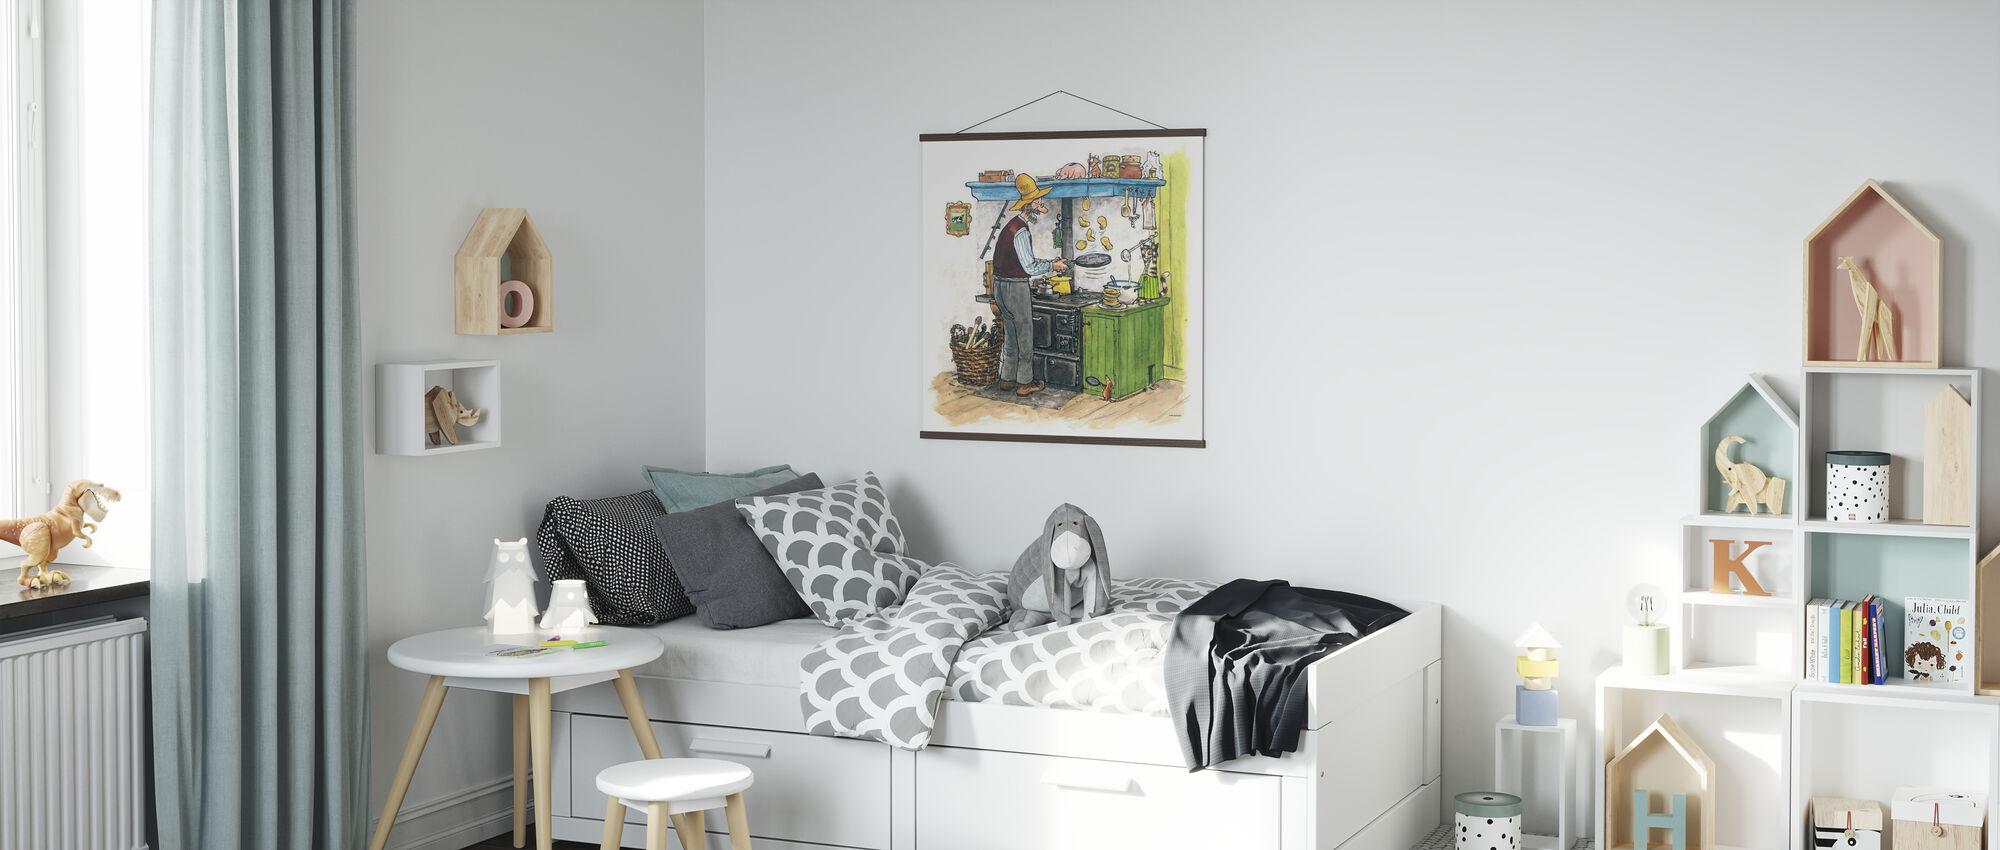 Findus si allontana - Poster - Camera dei bambini